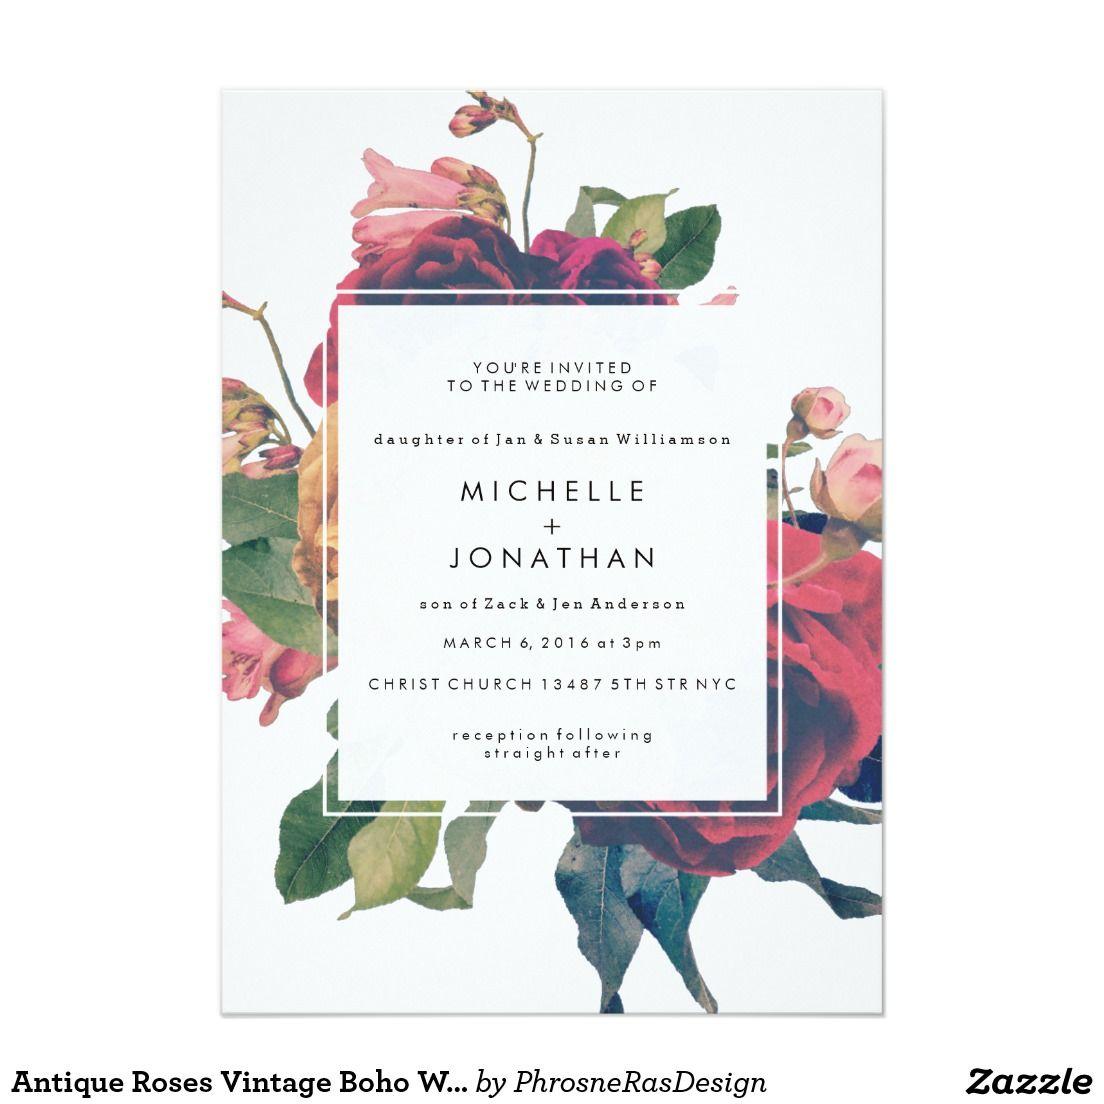 Antique Roses Vintage Boho Wedding Invitation | Wedding vintage ...